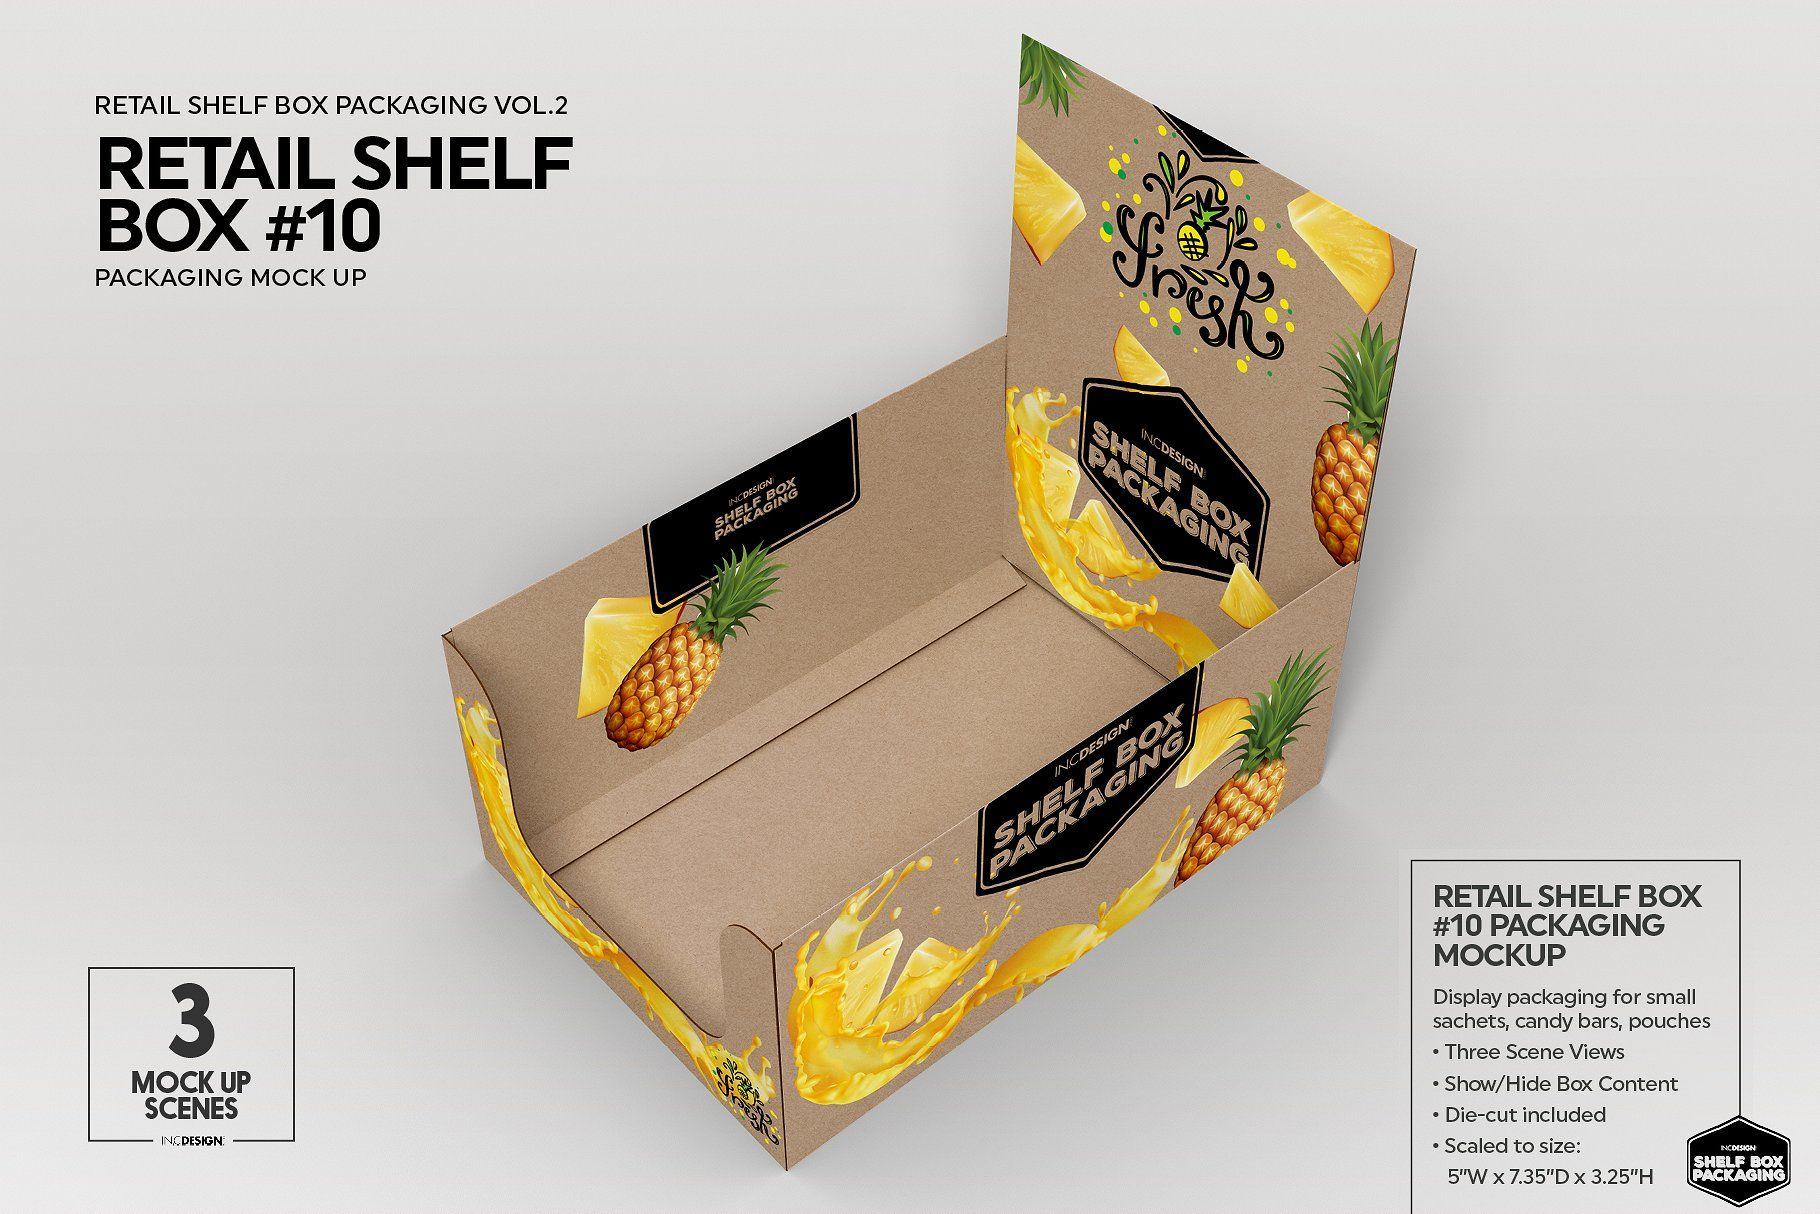 Download Retail Shelf Box 10 Packaging Mockup Packaging Mockup Retail Shelving Simple Graphic